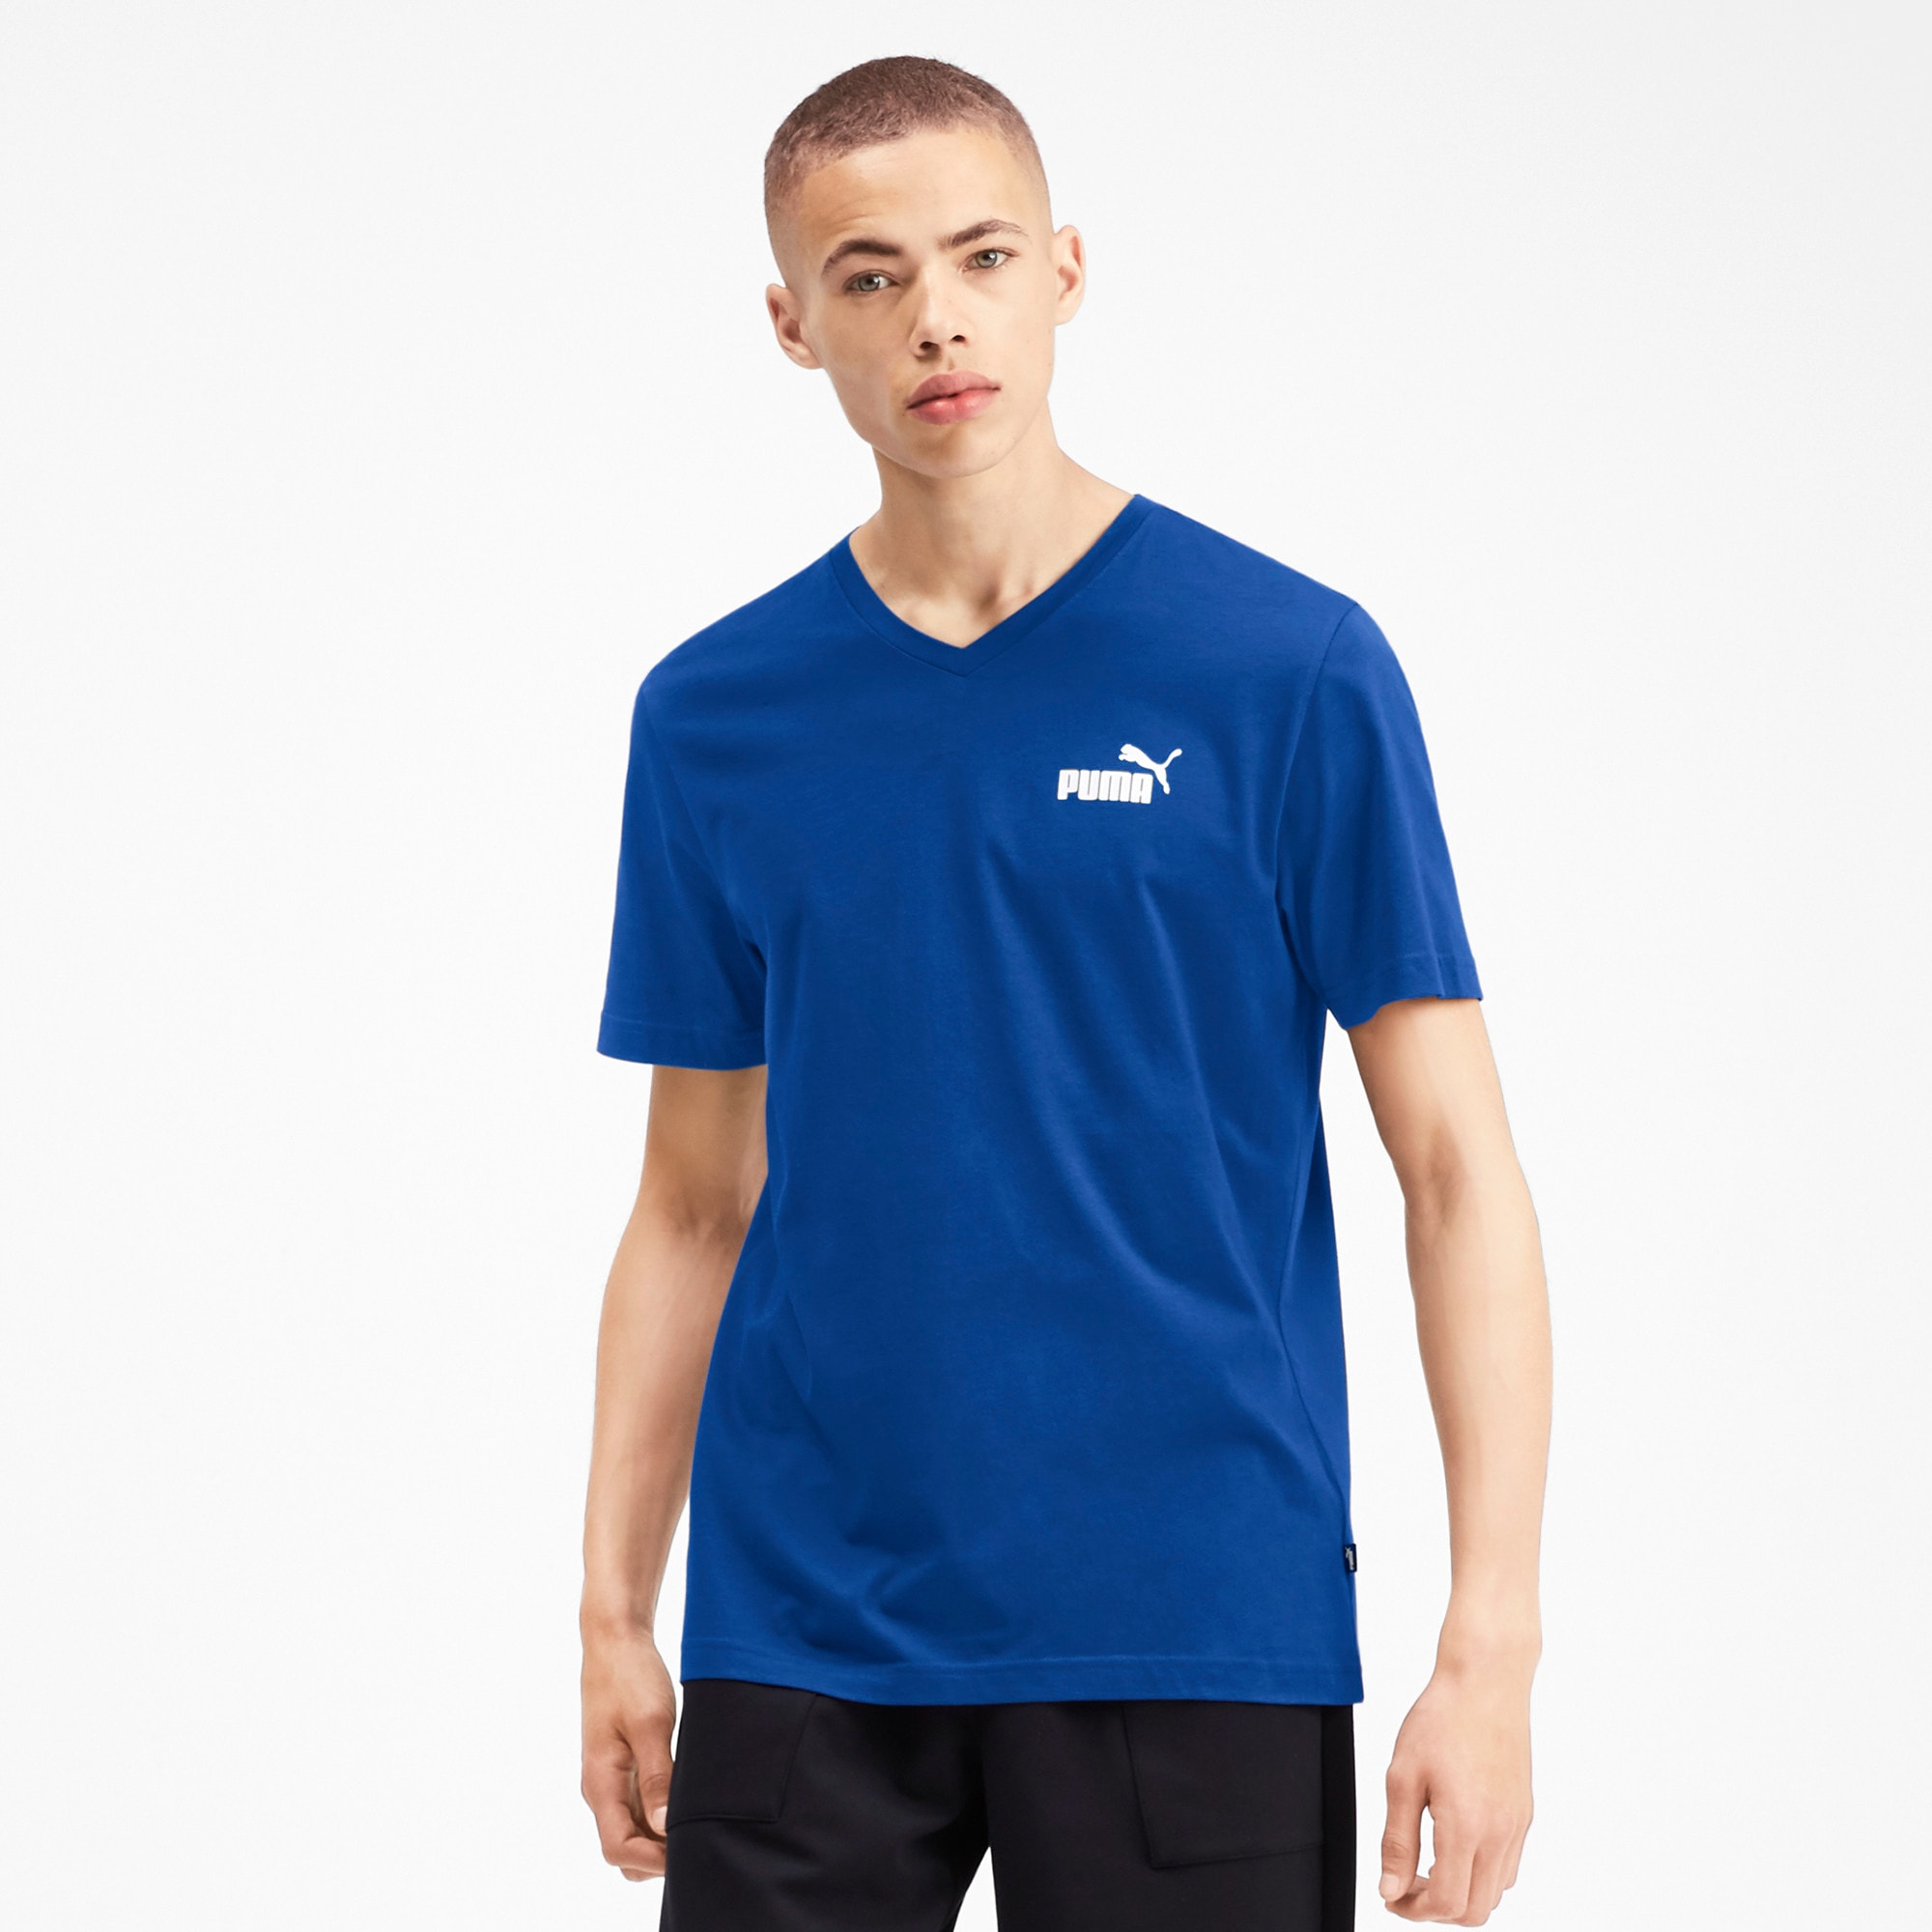 Thumbnail 1 of T-shirt con scollo a V Essentials uomo, Galaxy Blue, medium